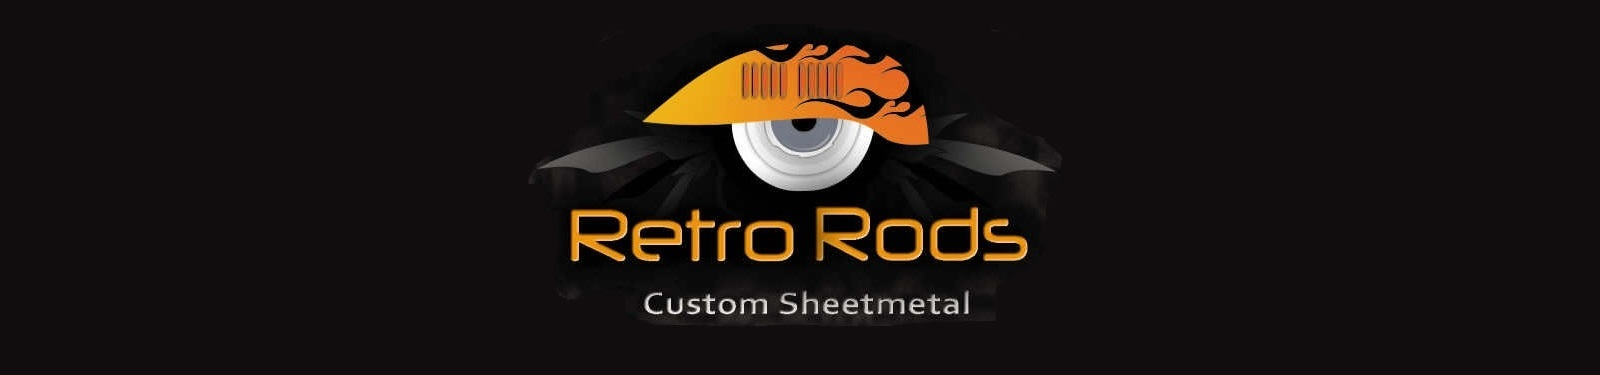 Retro Rods